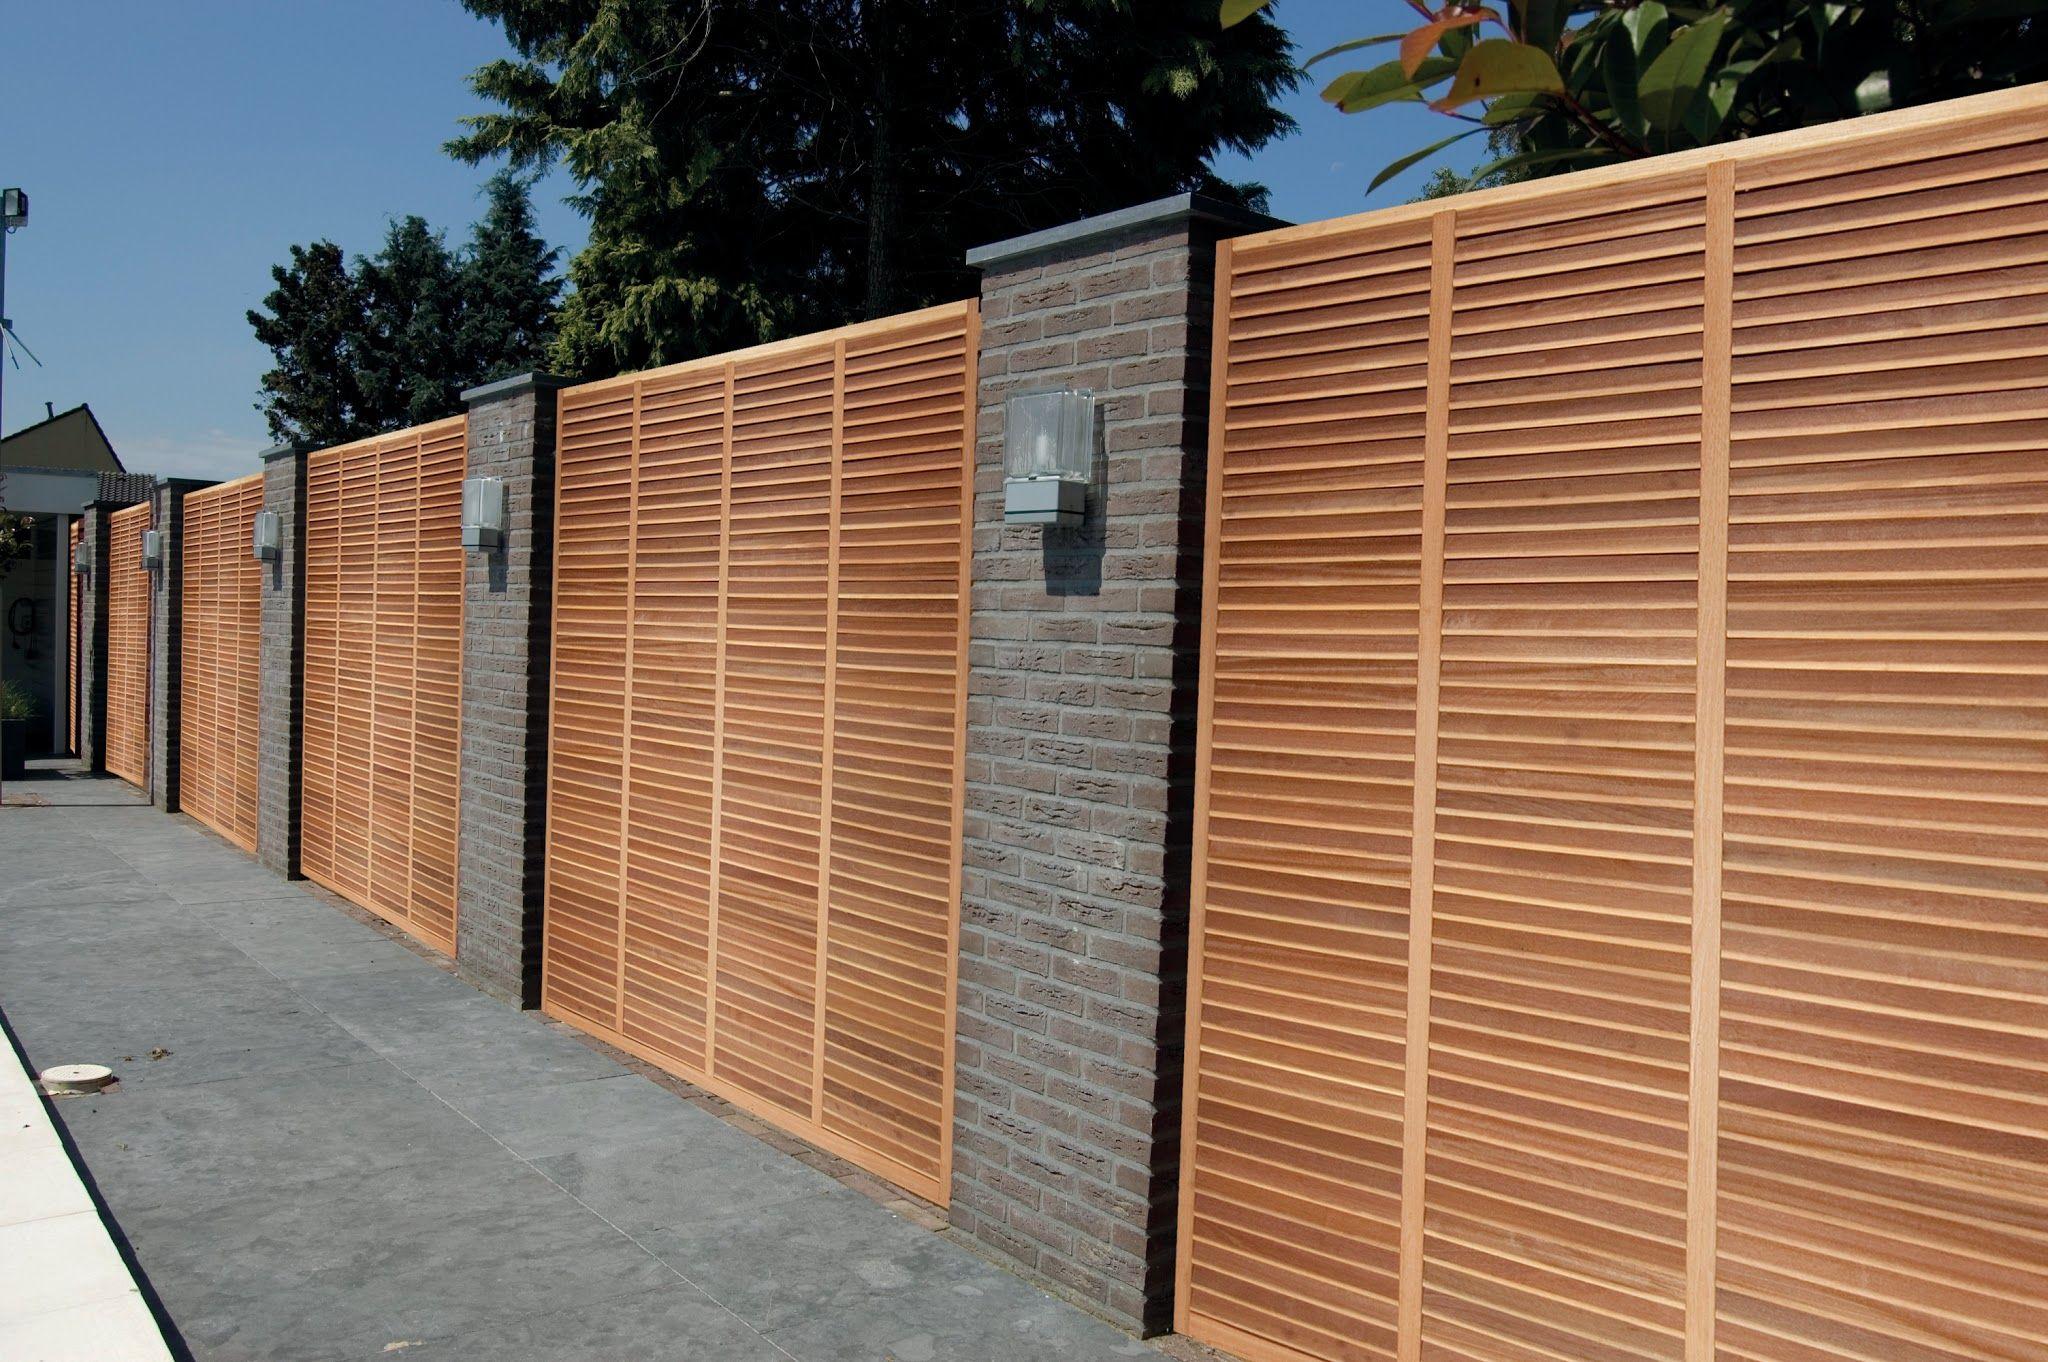 superbe cl ture jardin en bois exotiques treillis en bois exotiques pinterest bois. Black Bedroom Furniture Sets. Home Design Ideas